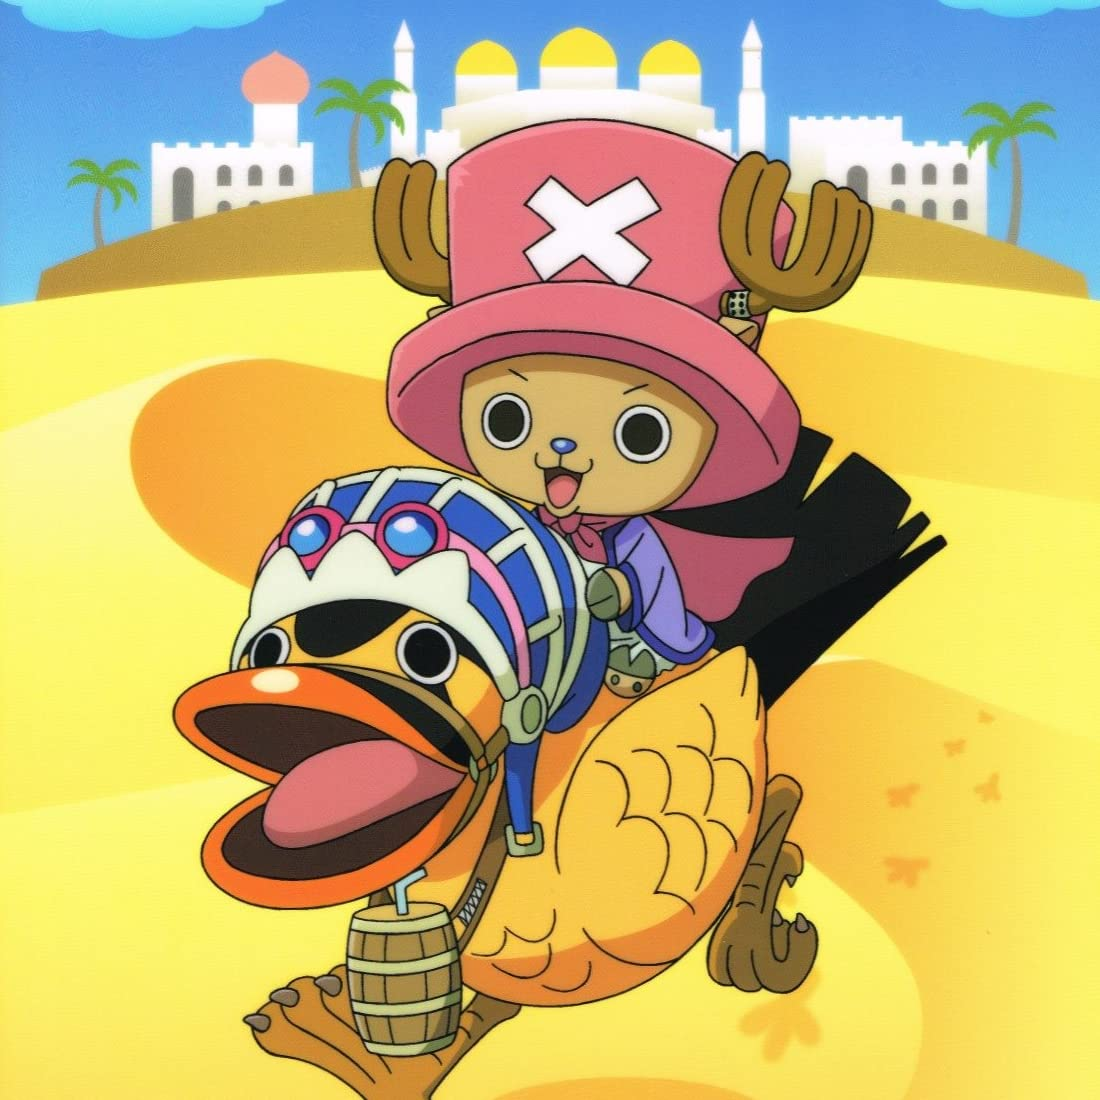 One Piece Ipad壁紙アニメ画像23939 スマポ